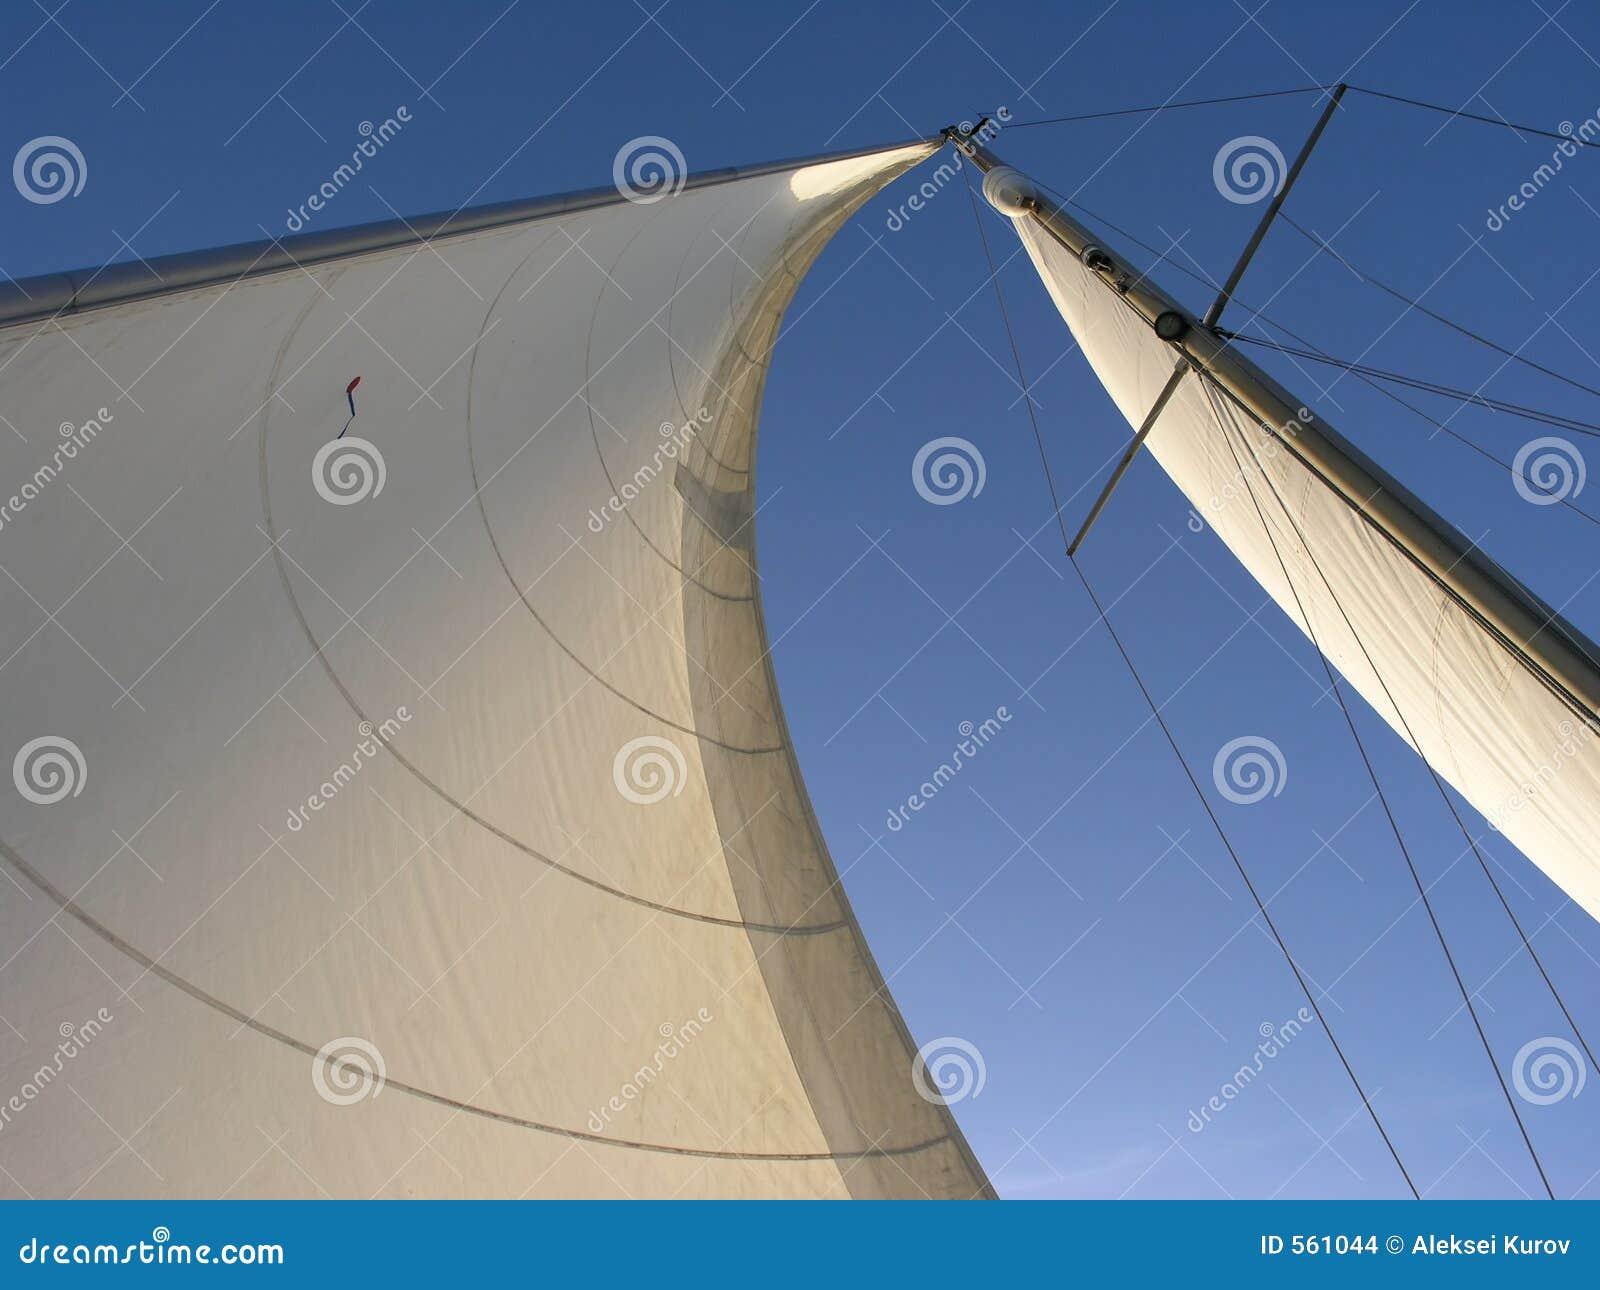 Two Sails: Genoa And Mainsail Stock Photo - Image of boating